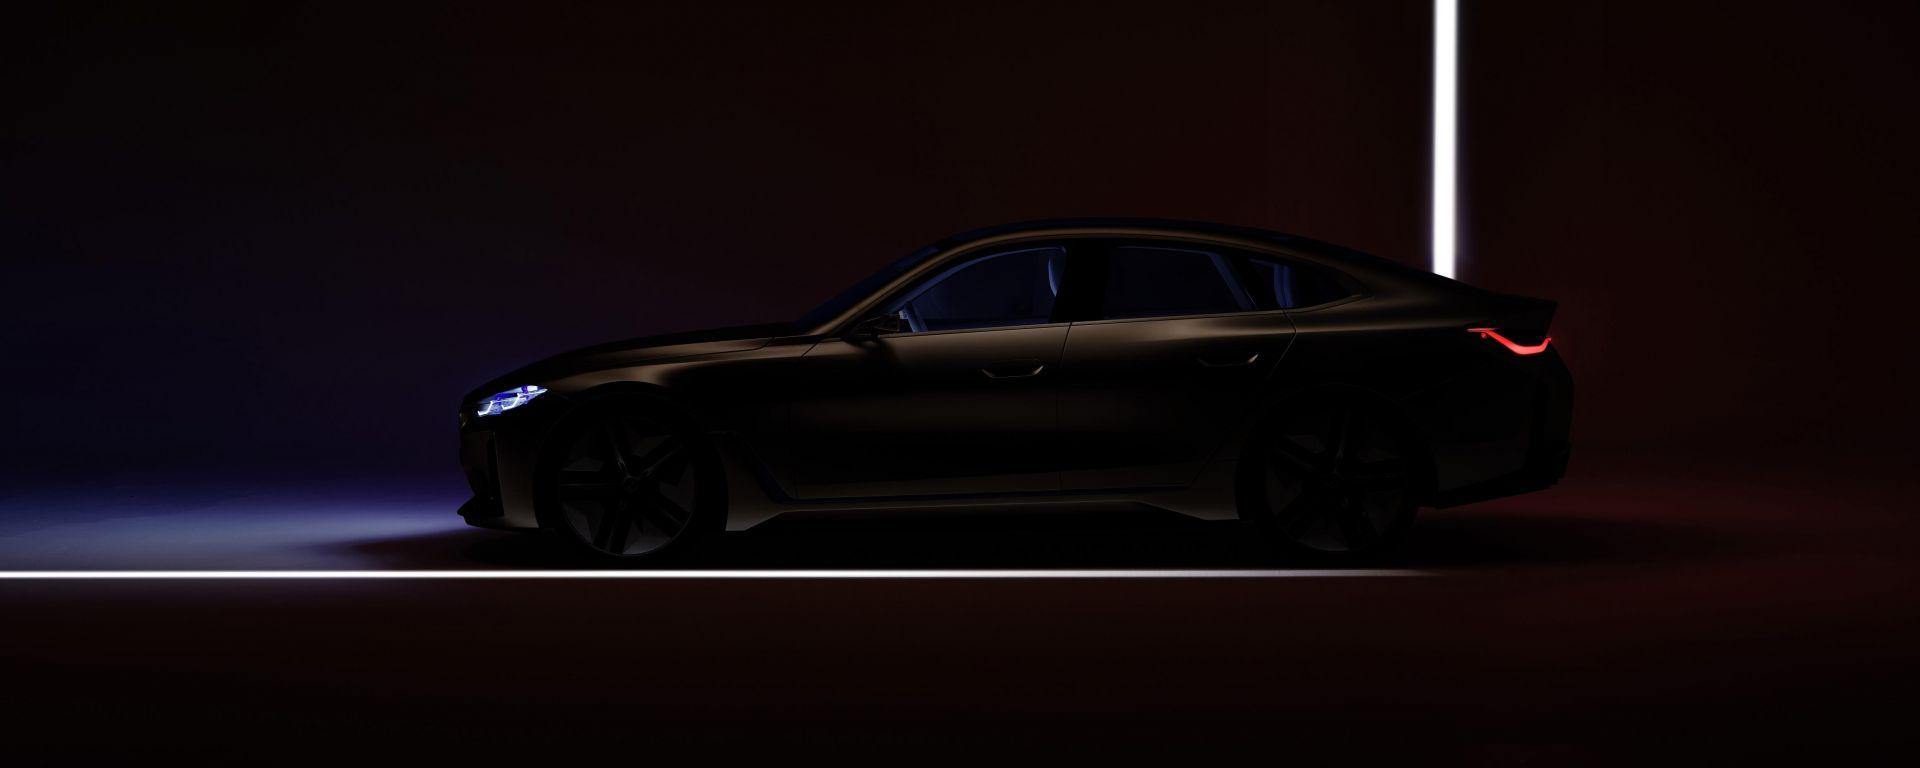 BMW concept i4 al Salone di Ginevra (in streaming)